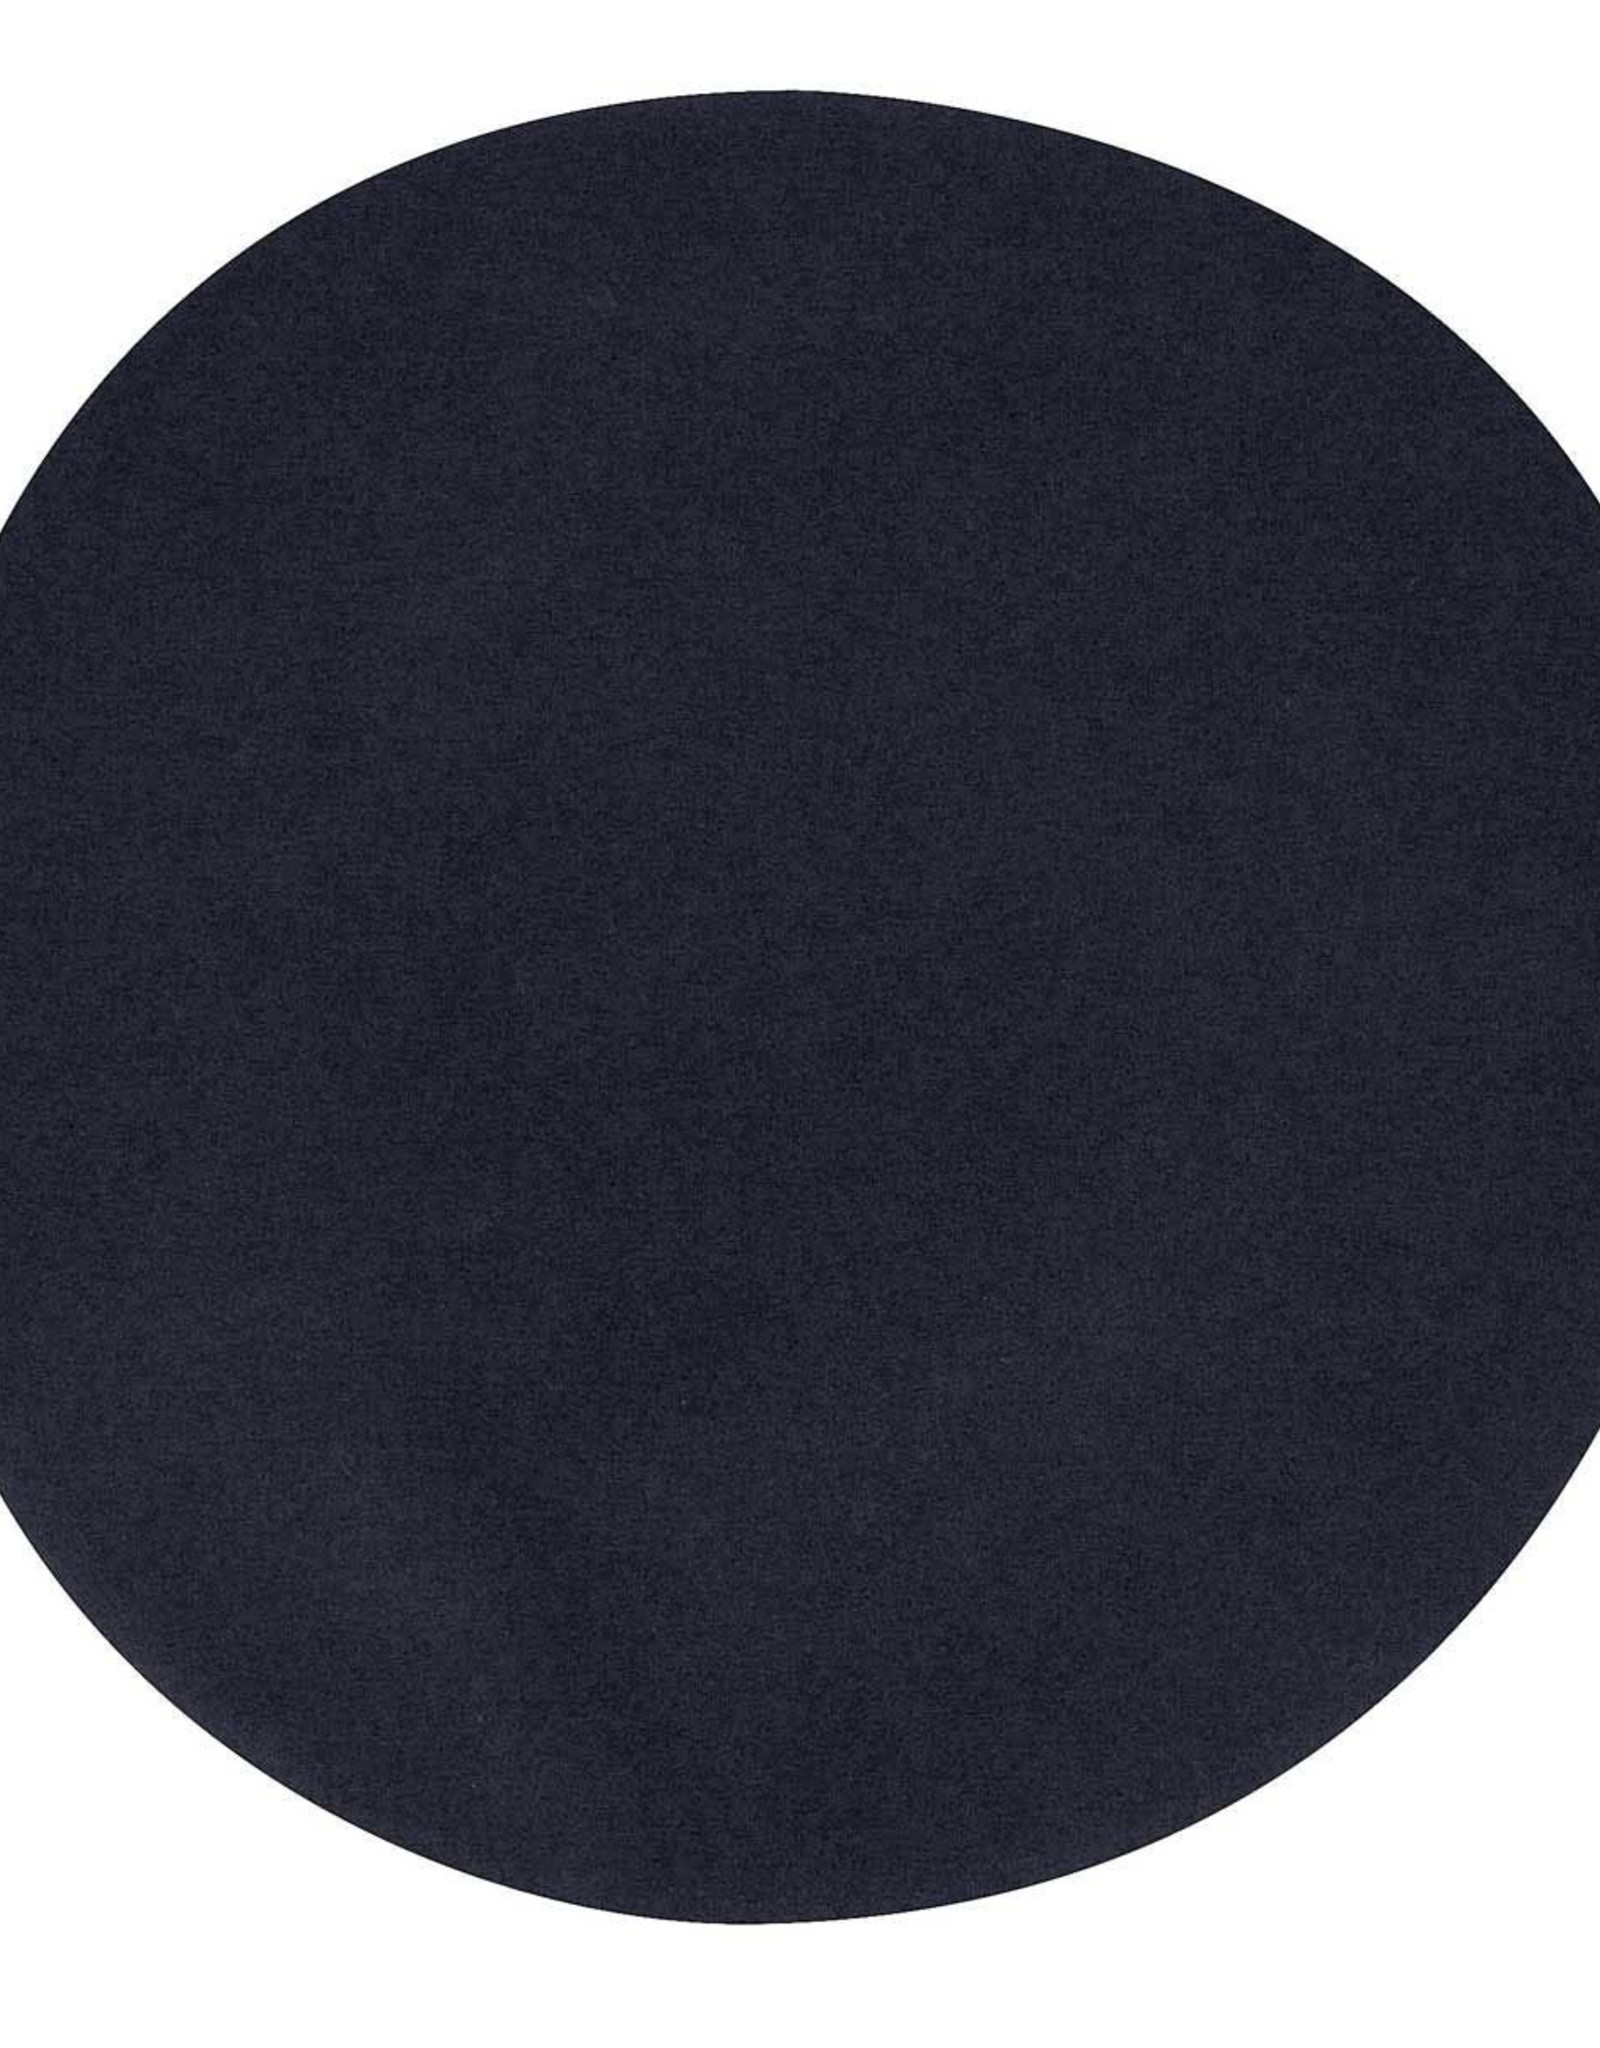 kangol Kangol Wool Monty Dark Blue size S